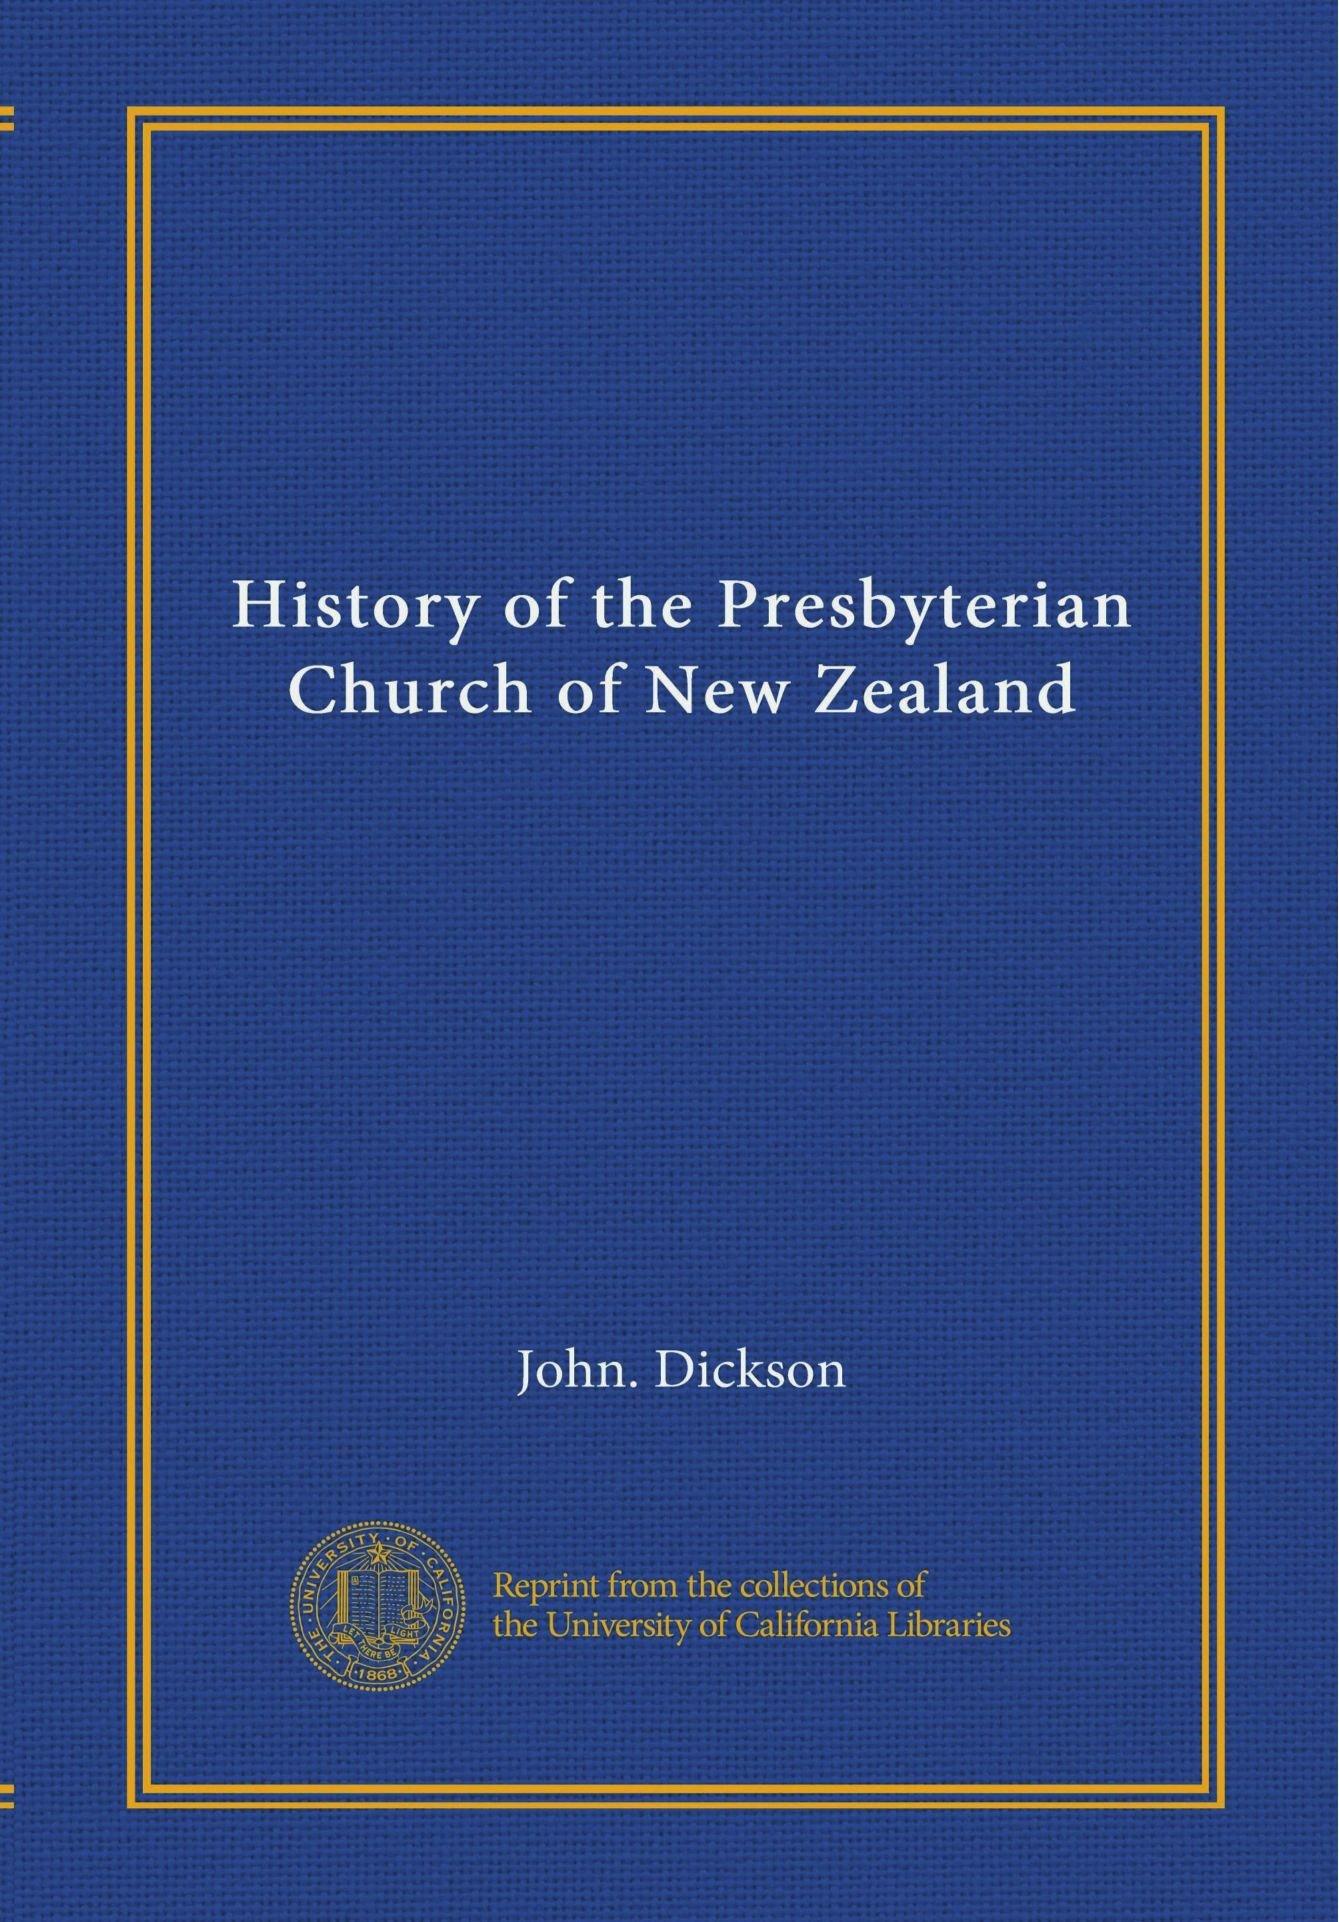 History of the Presbyterian Church of New Zealand pdf